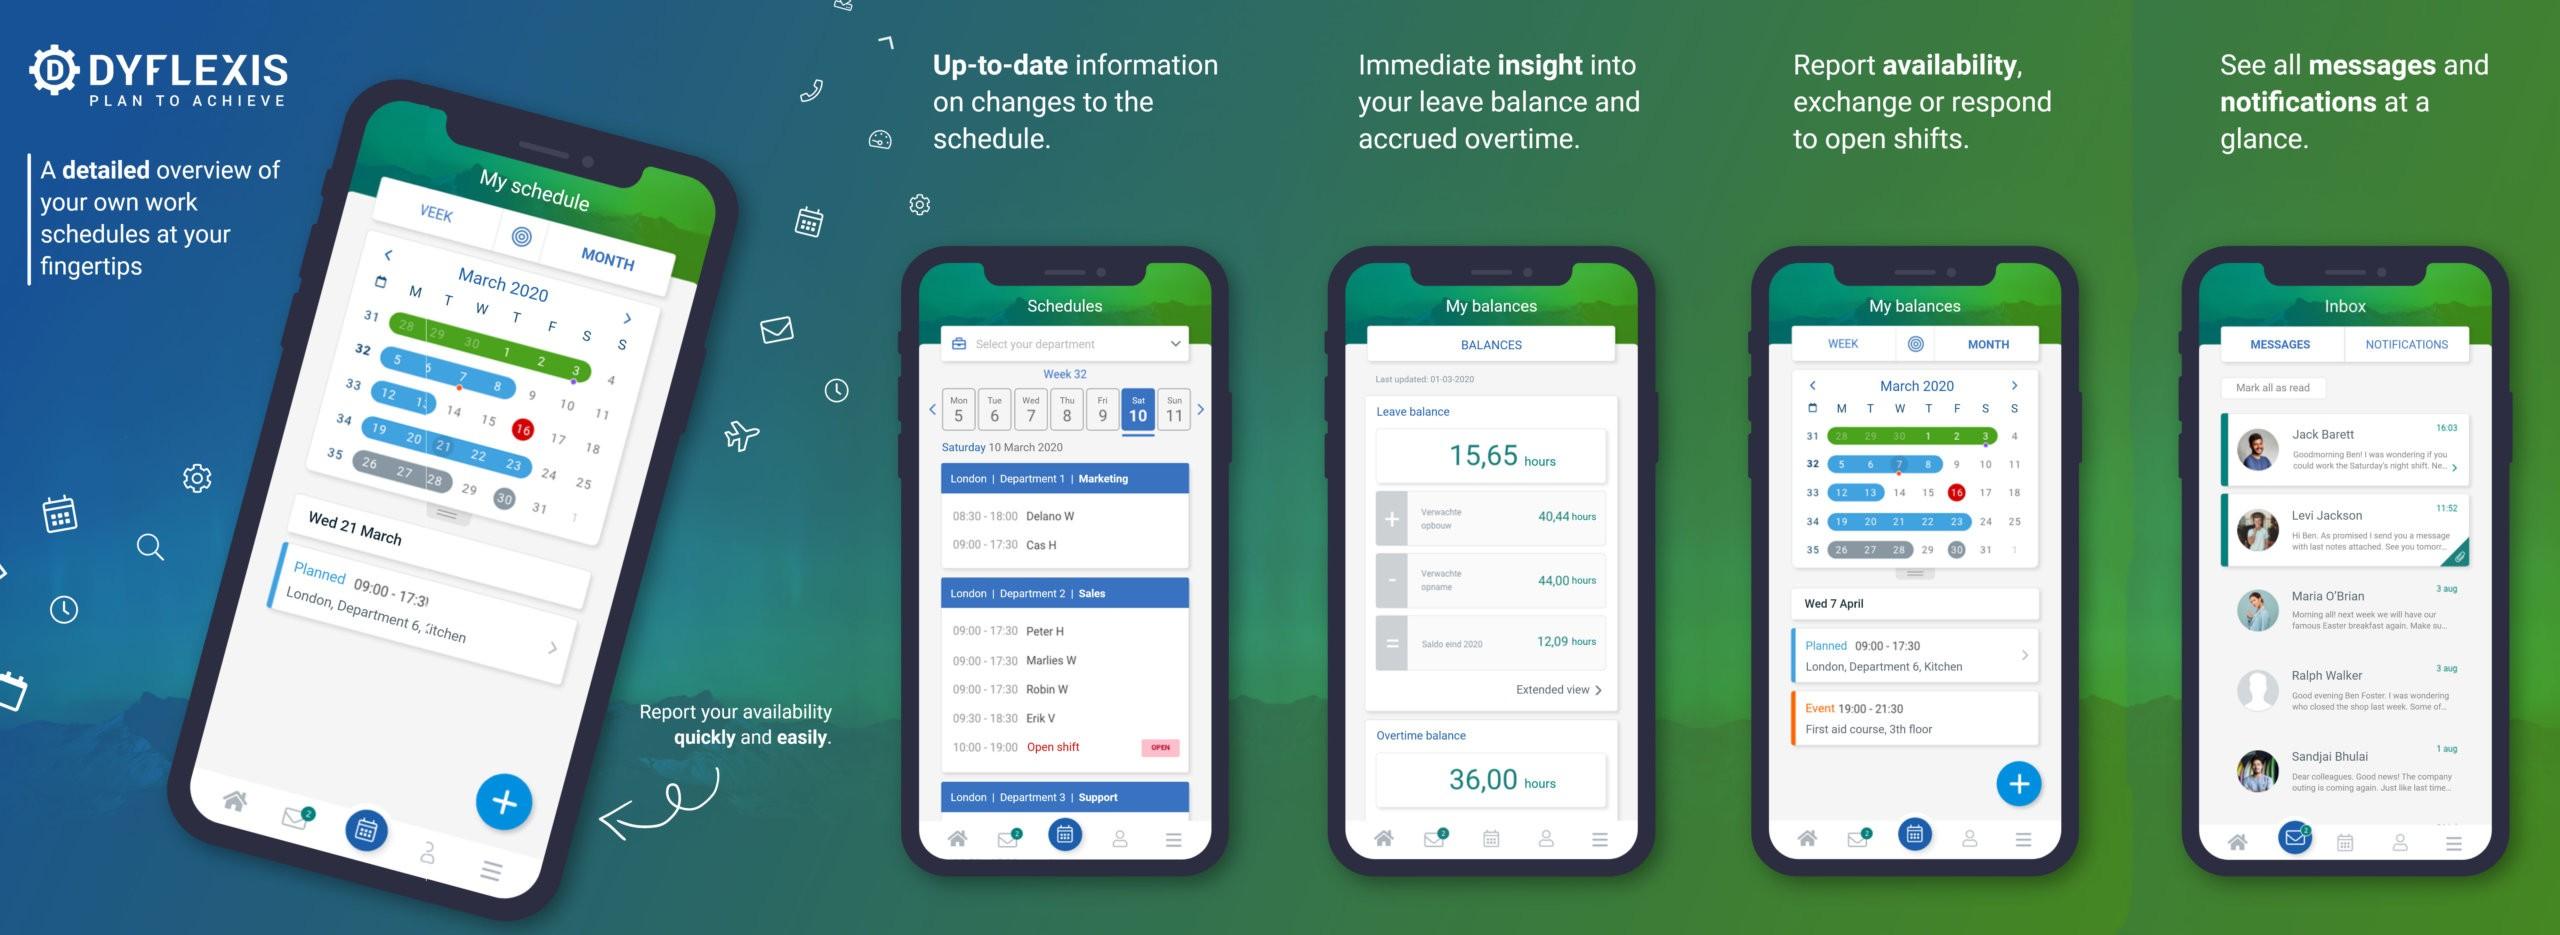 Dyflexis personeelsplanning app